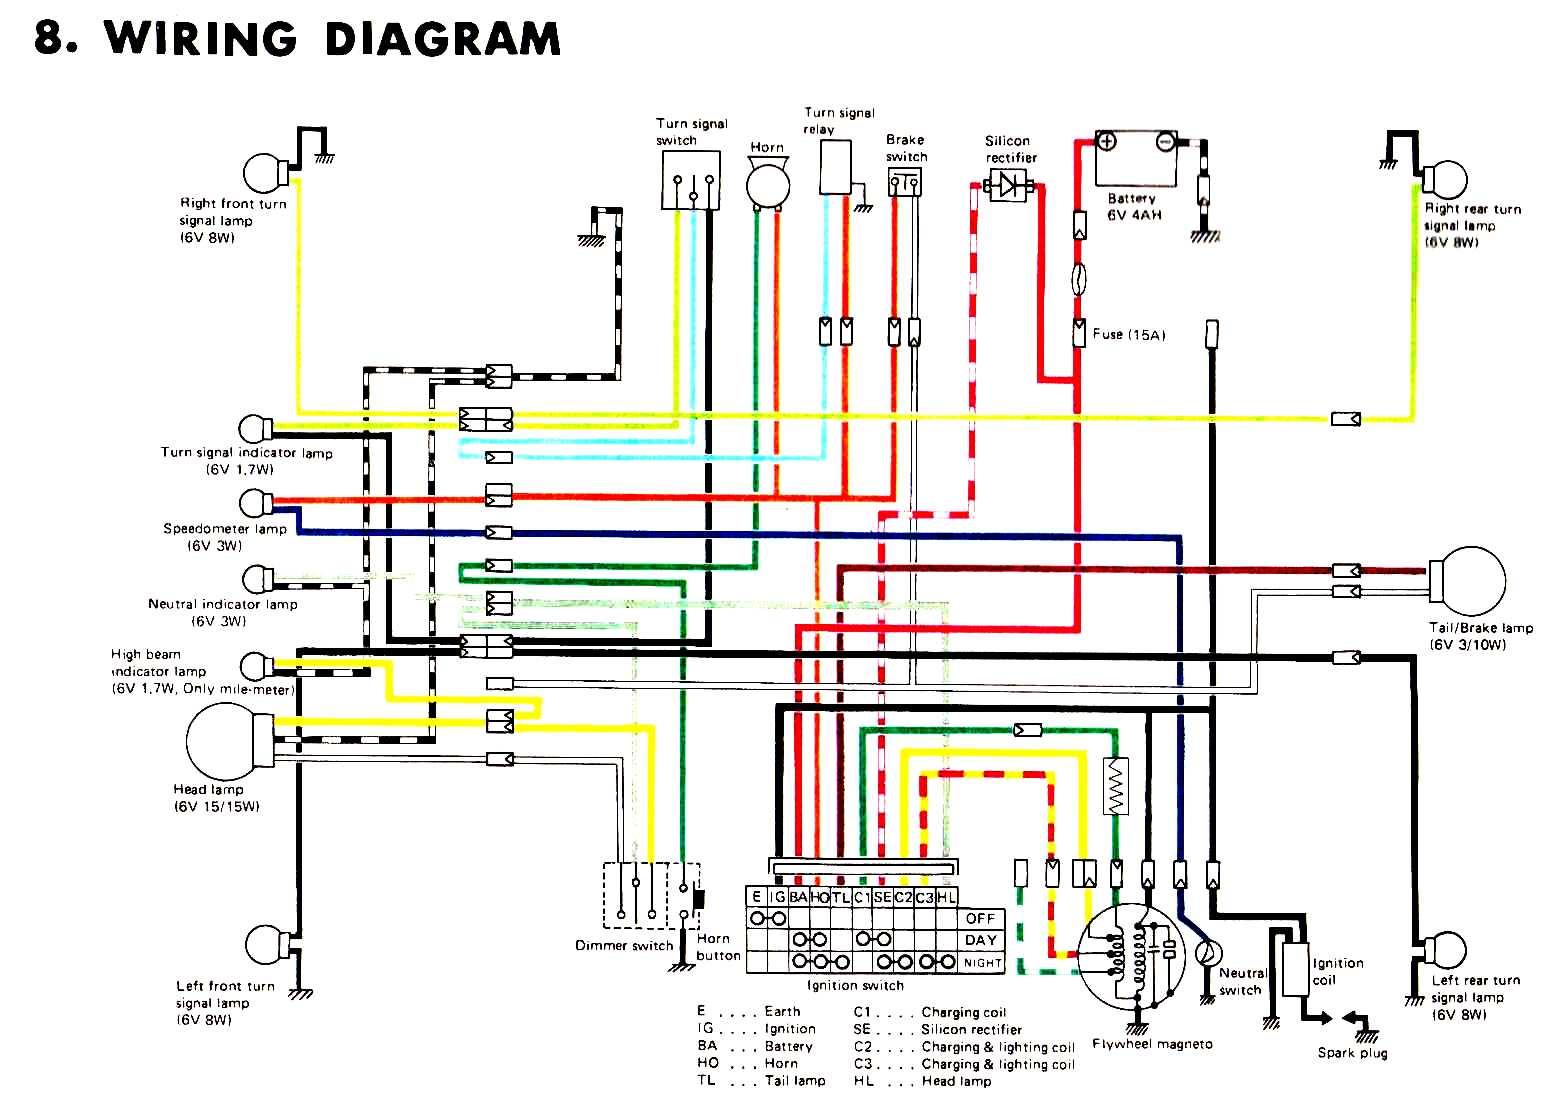 suzuki rv 50 wiring diagram 2002 land rover discovery radio schmudke de